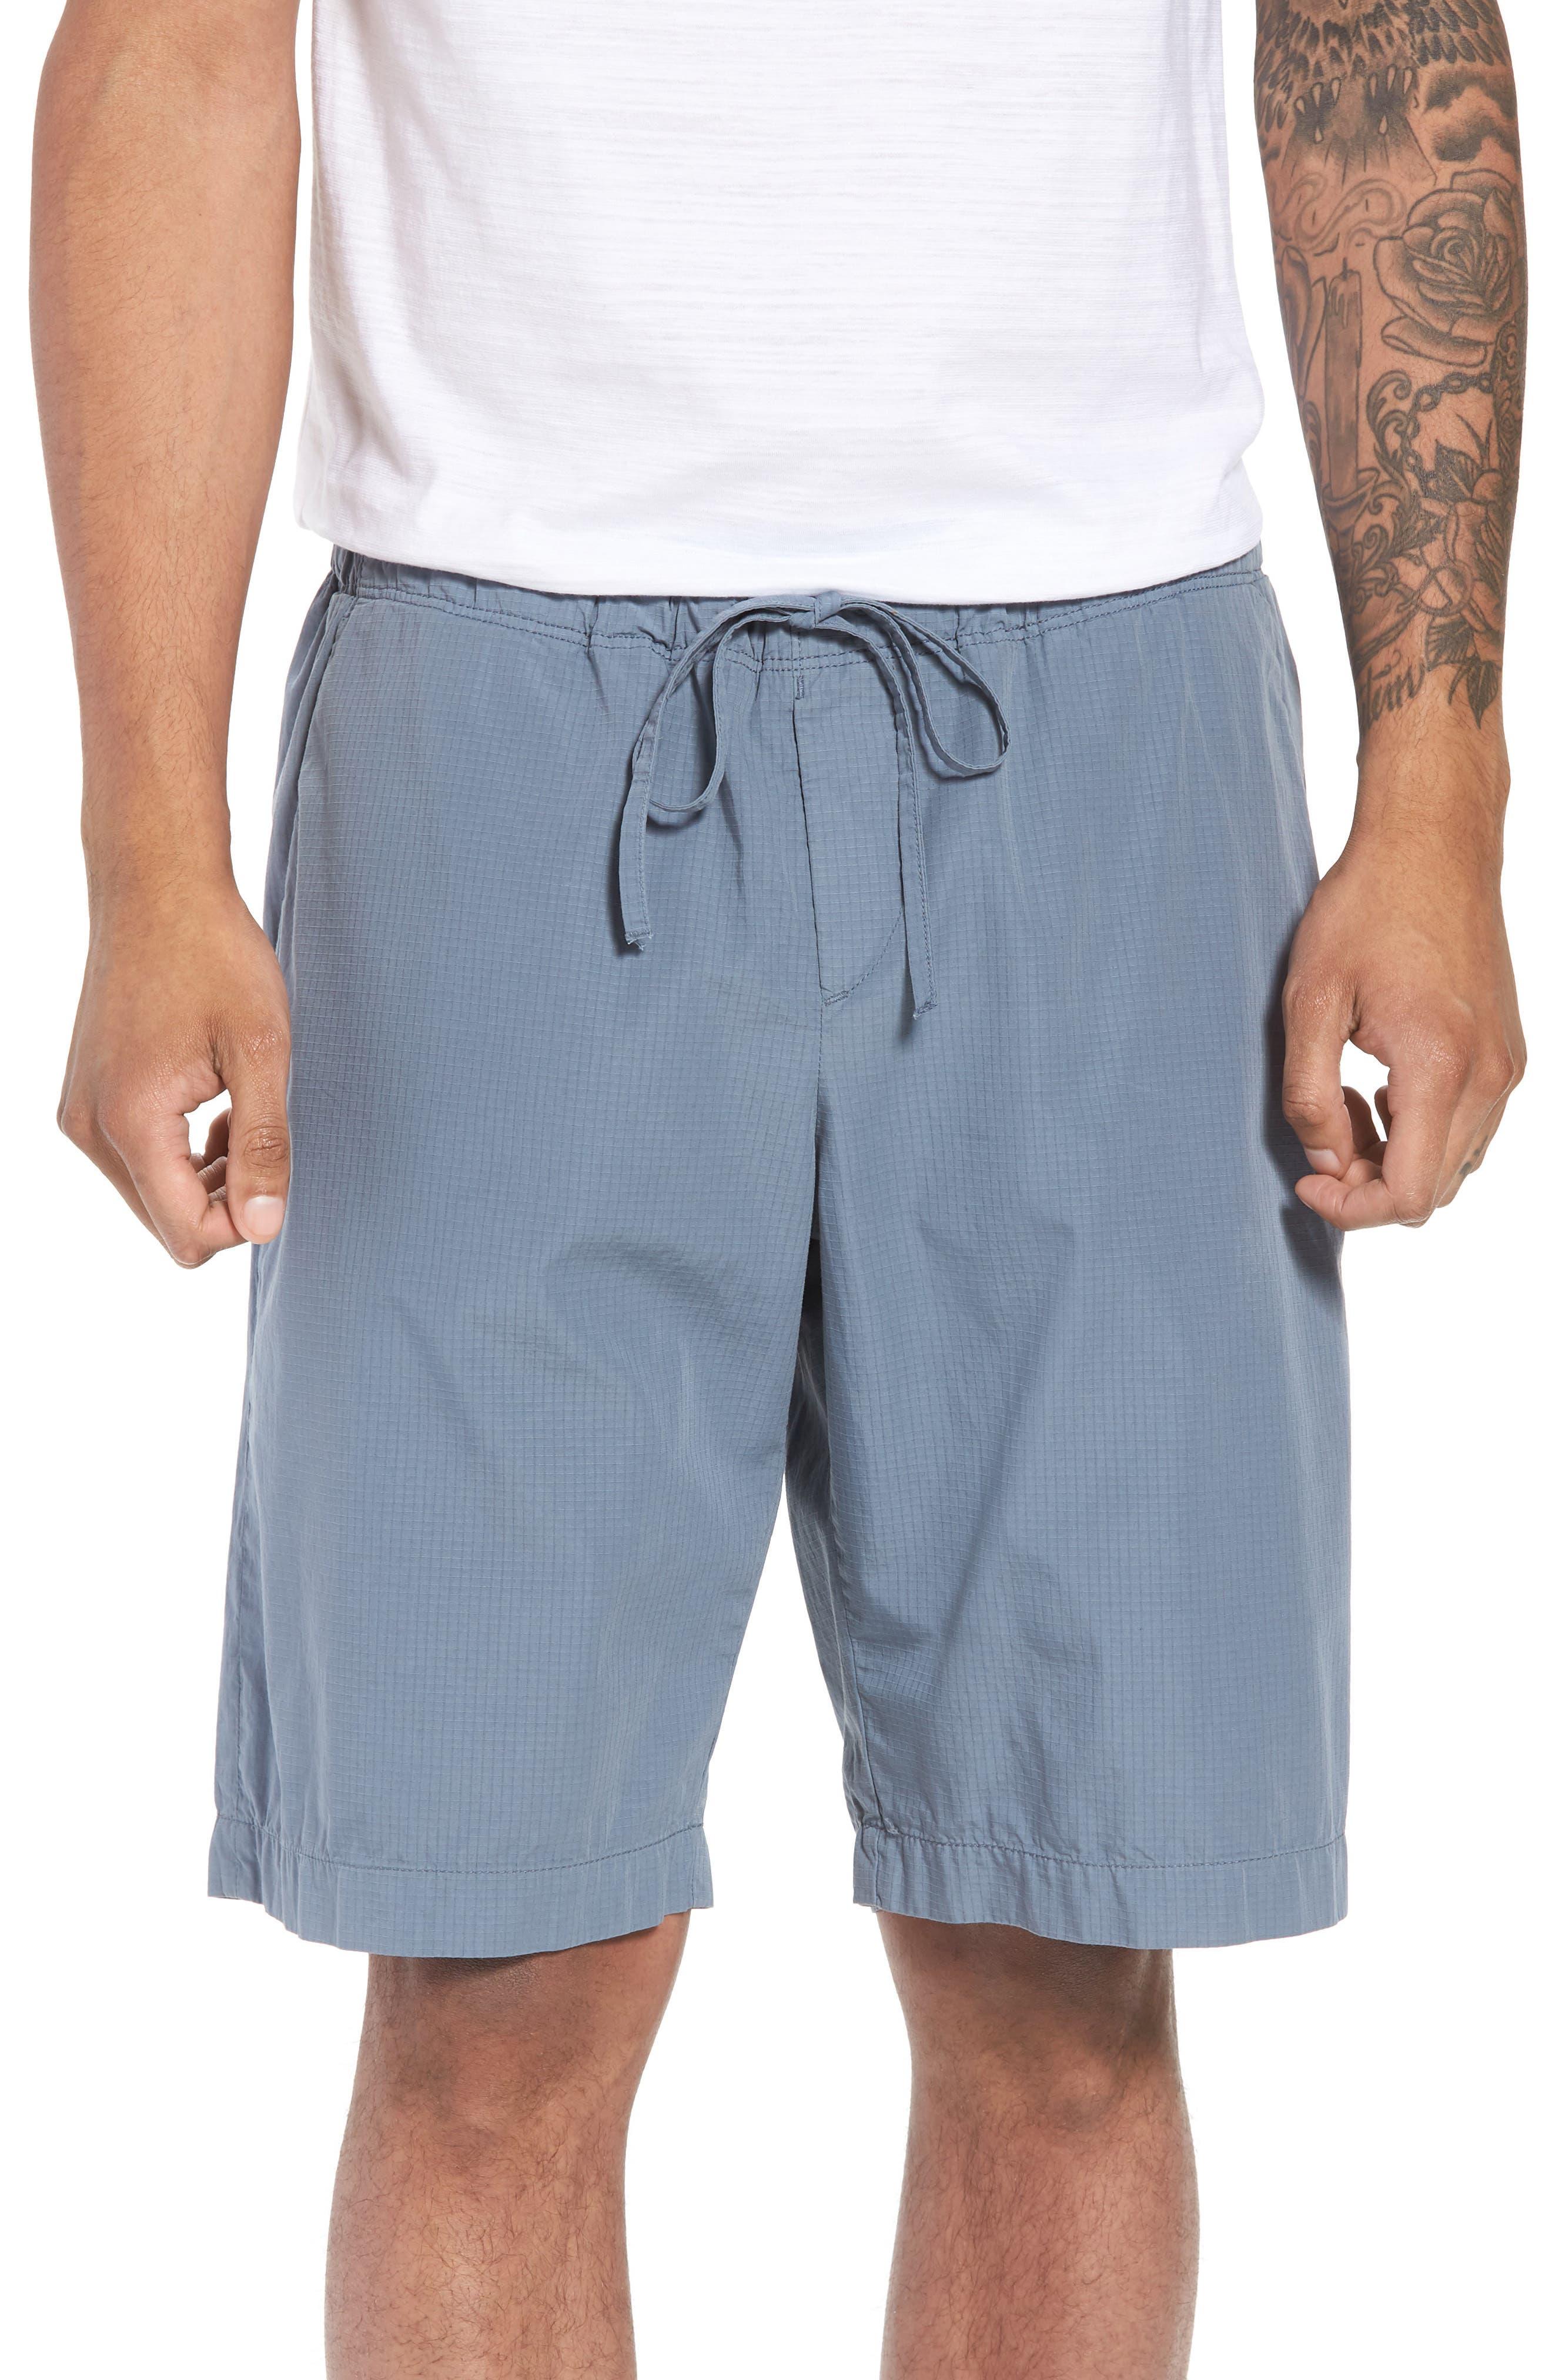 Passeo Cotton Shorts,                         Main,                         color, GREY